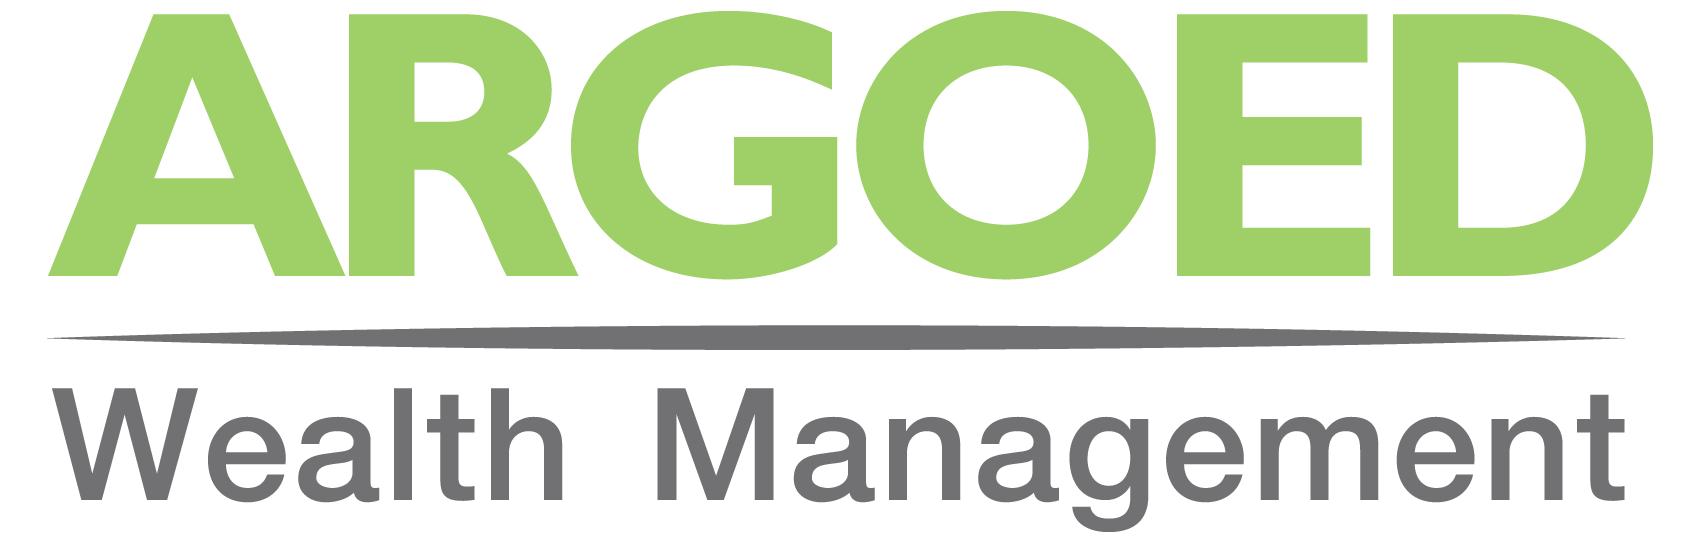 Argoed Wealth Management Ltd